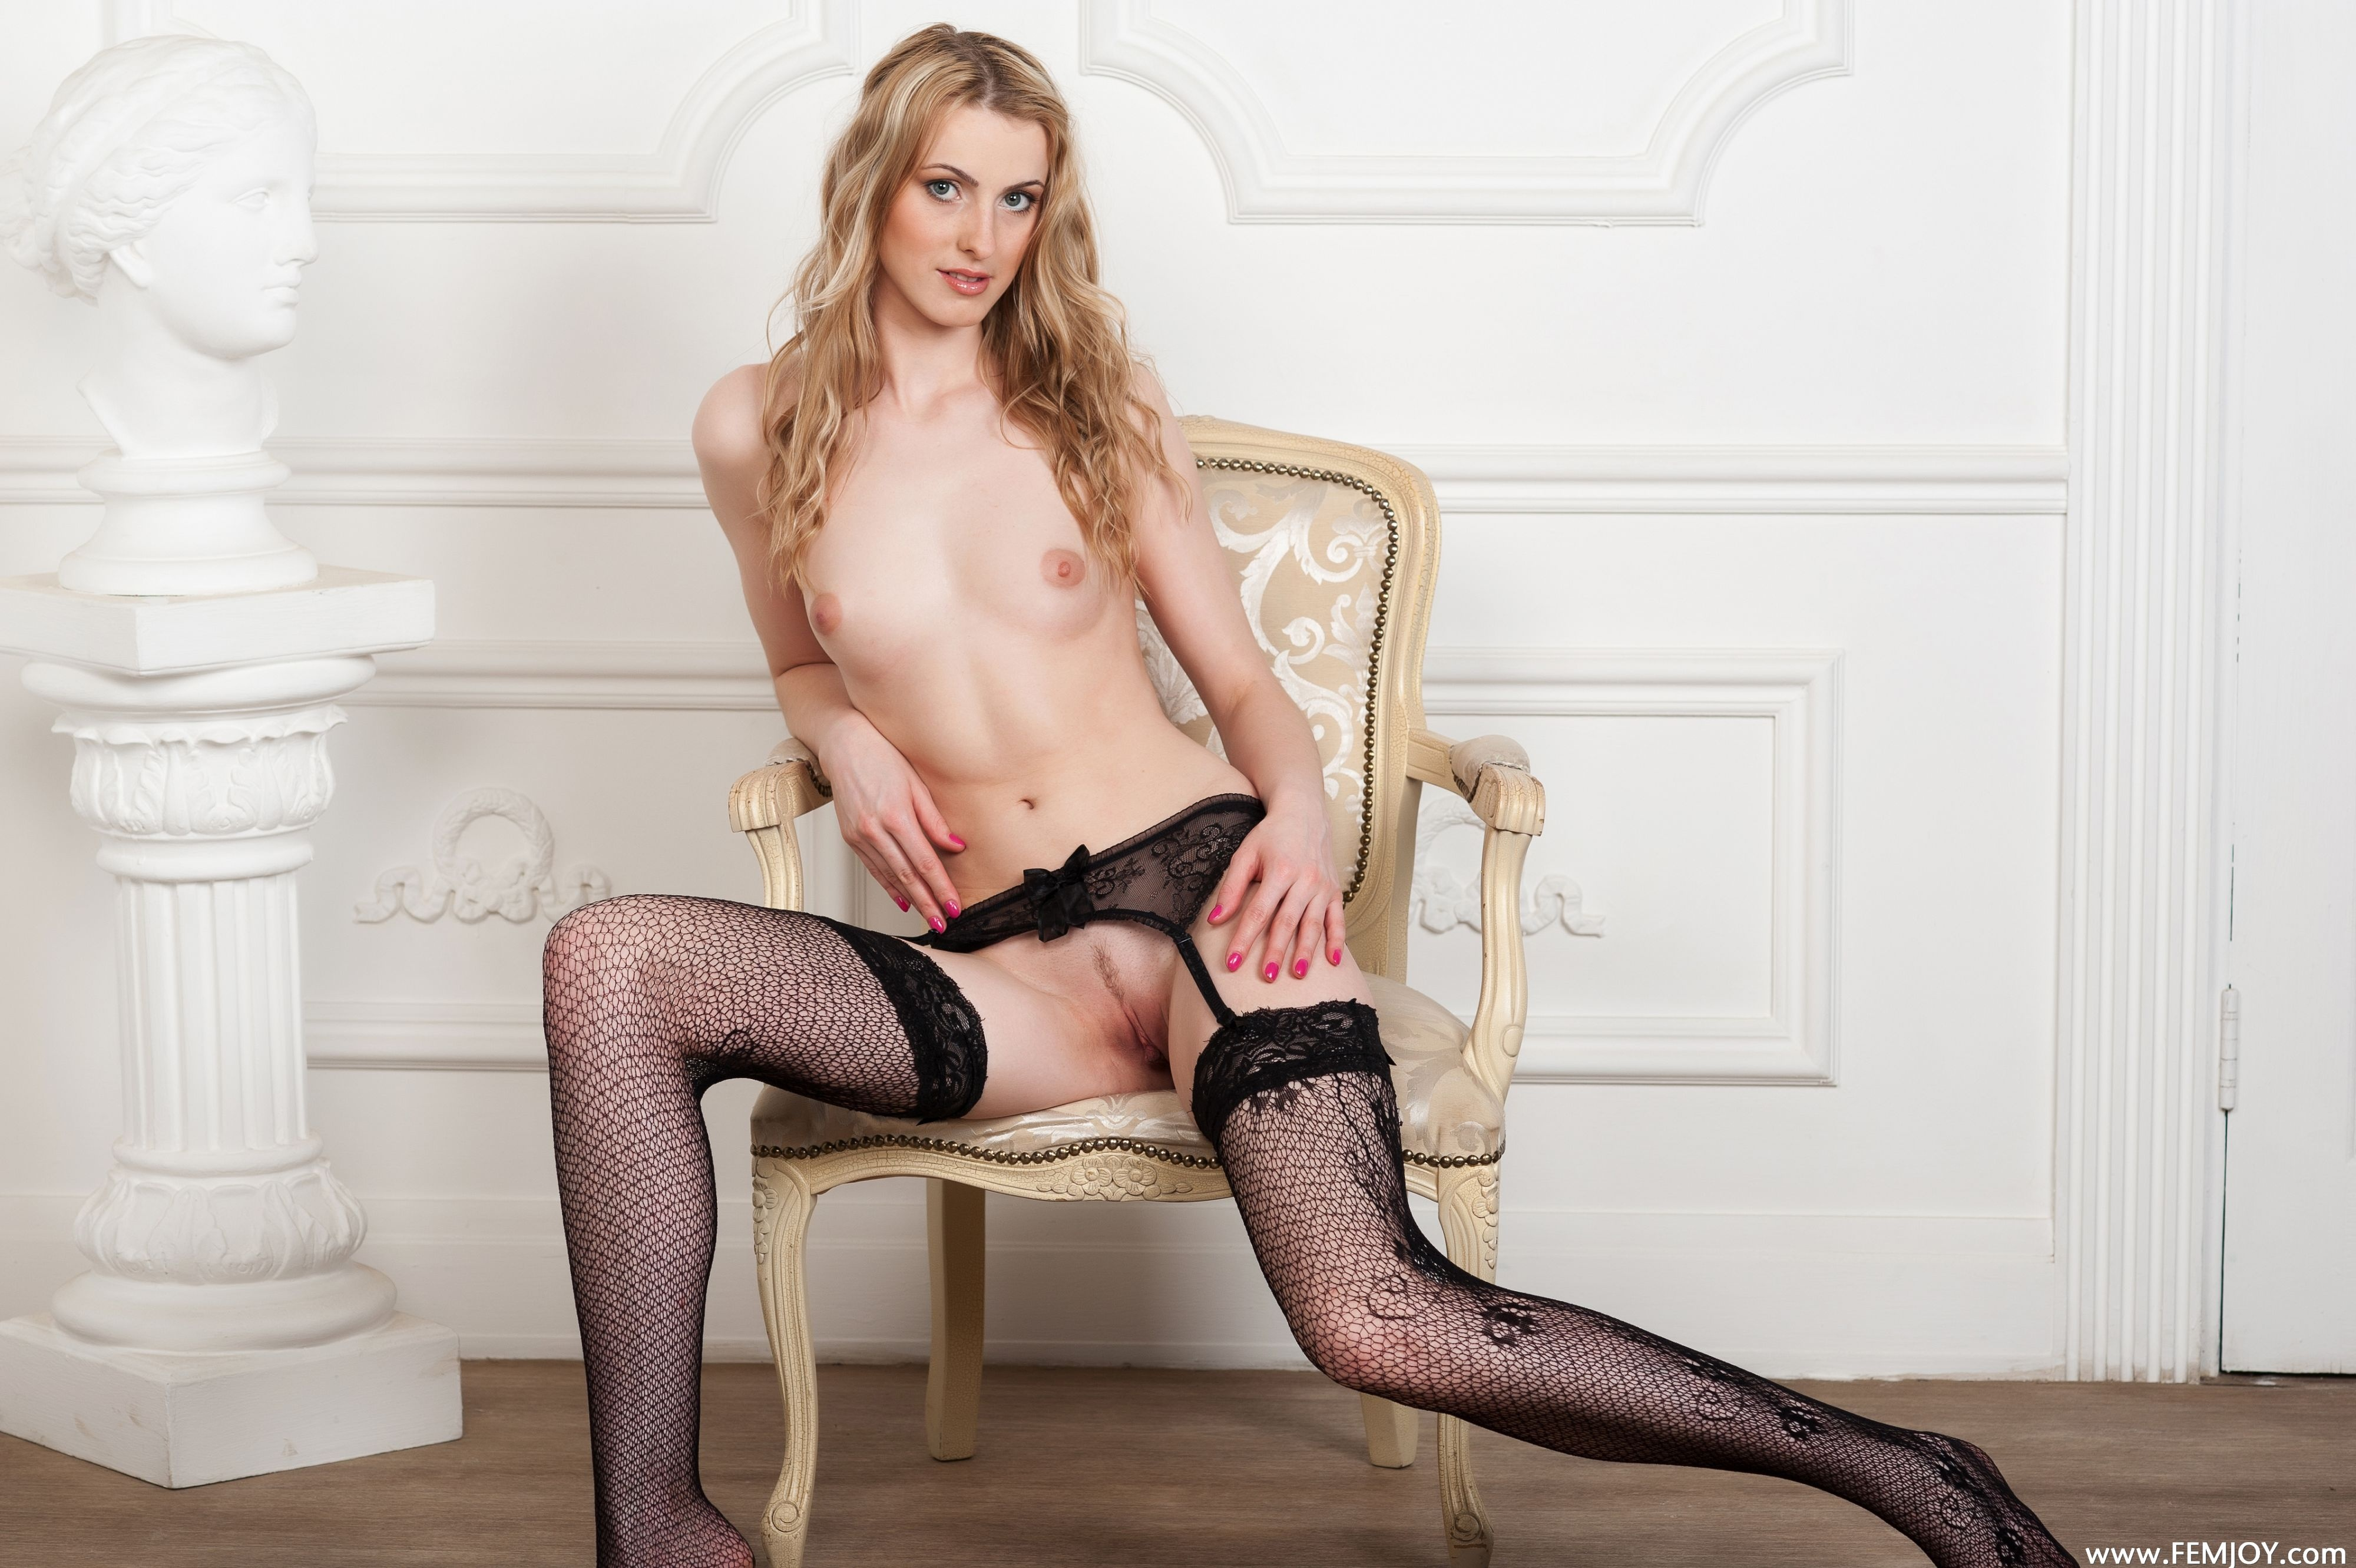 Small tit blonde black panties the